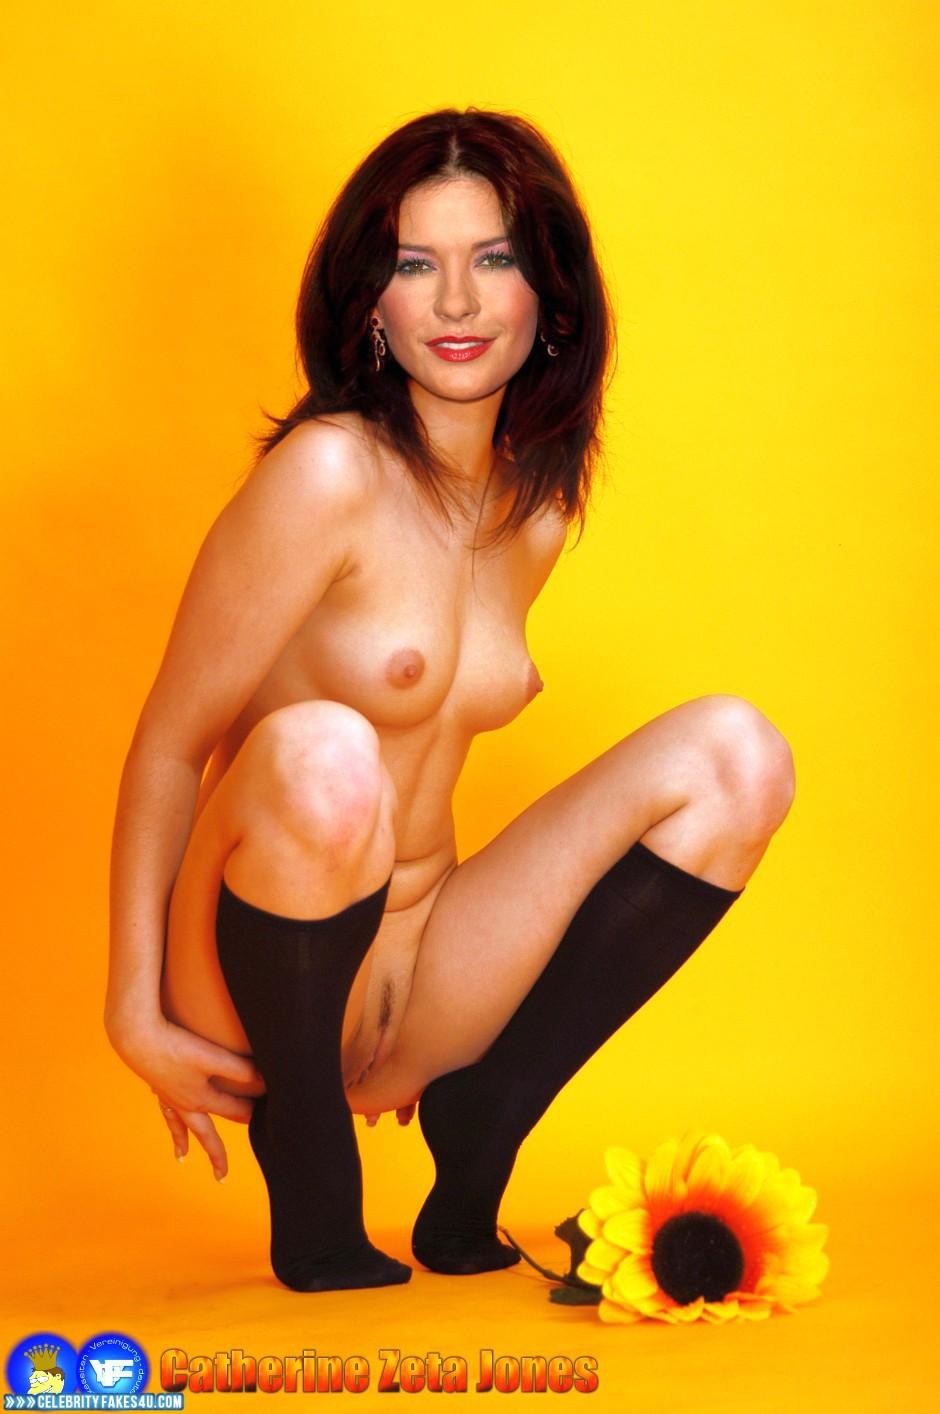 Fake catherine zeta-jones naked